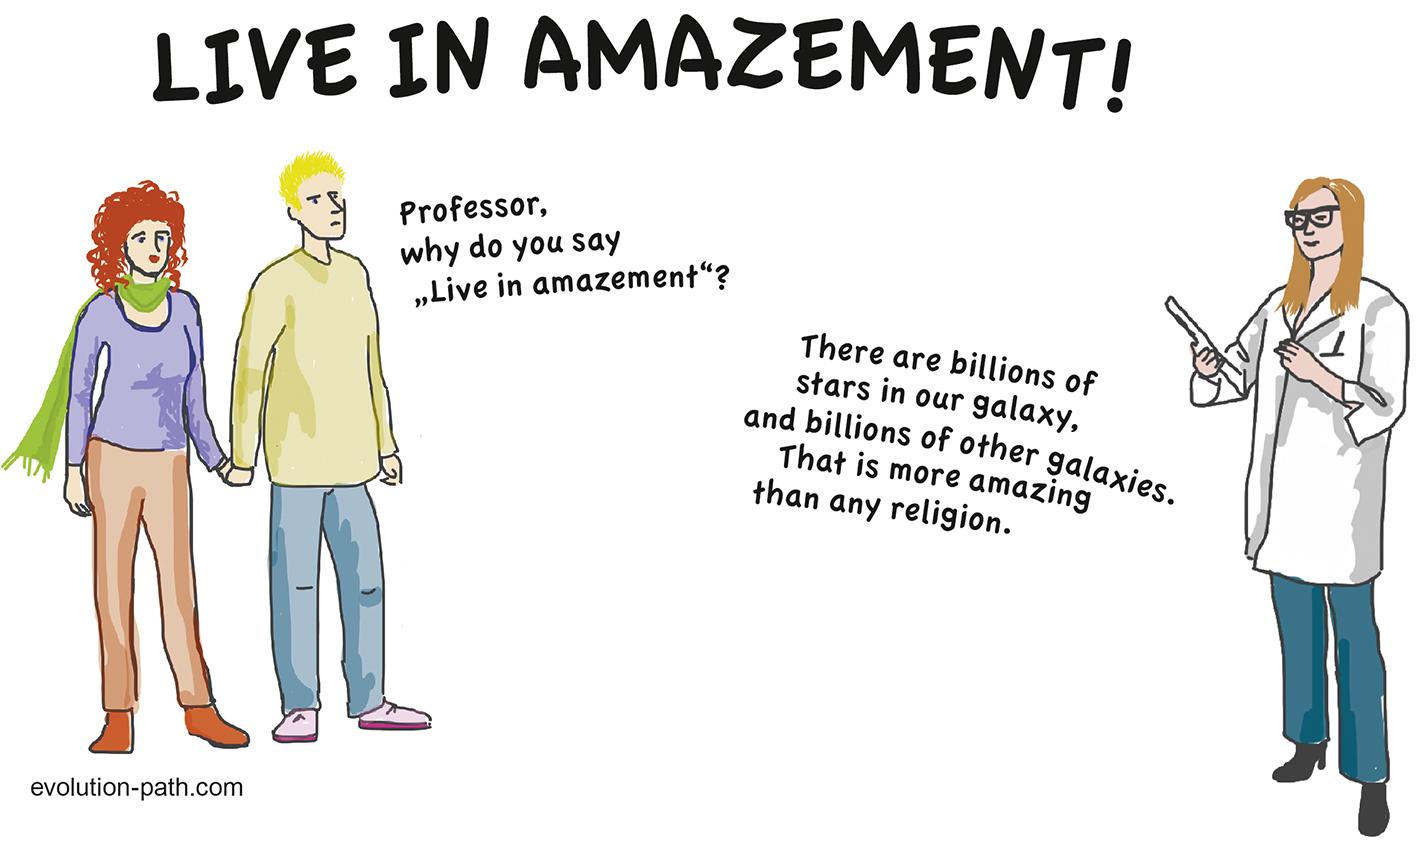 Evolution path, Live in amazement